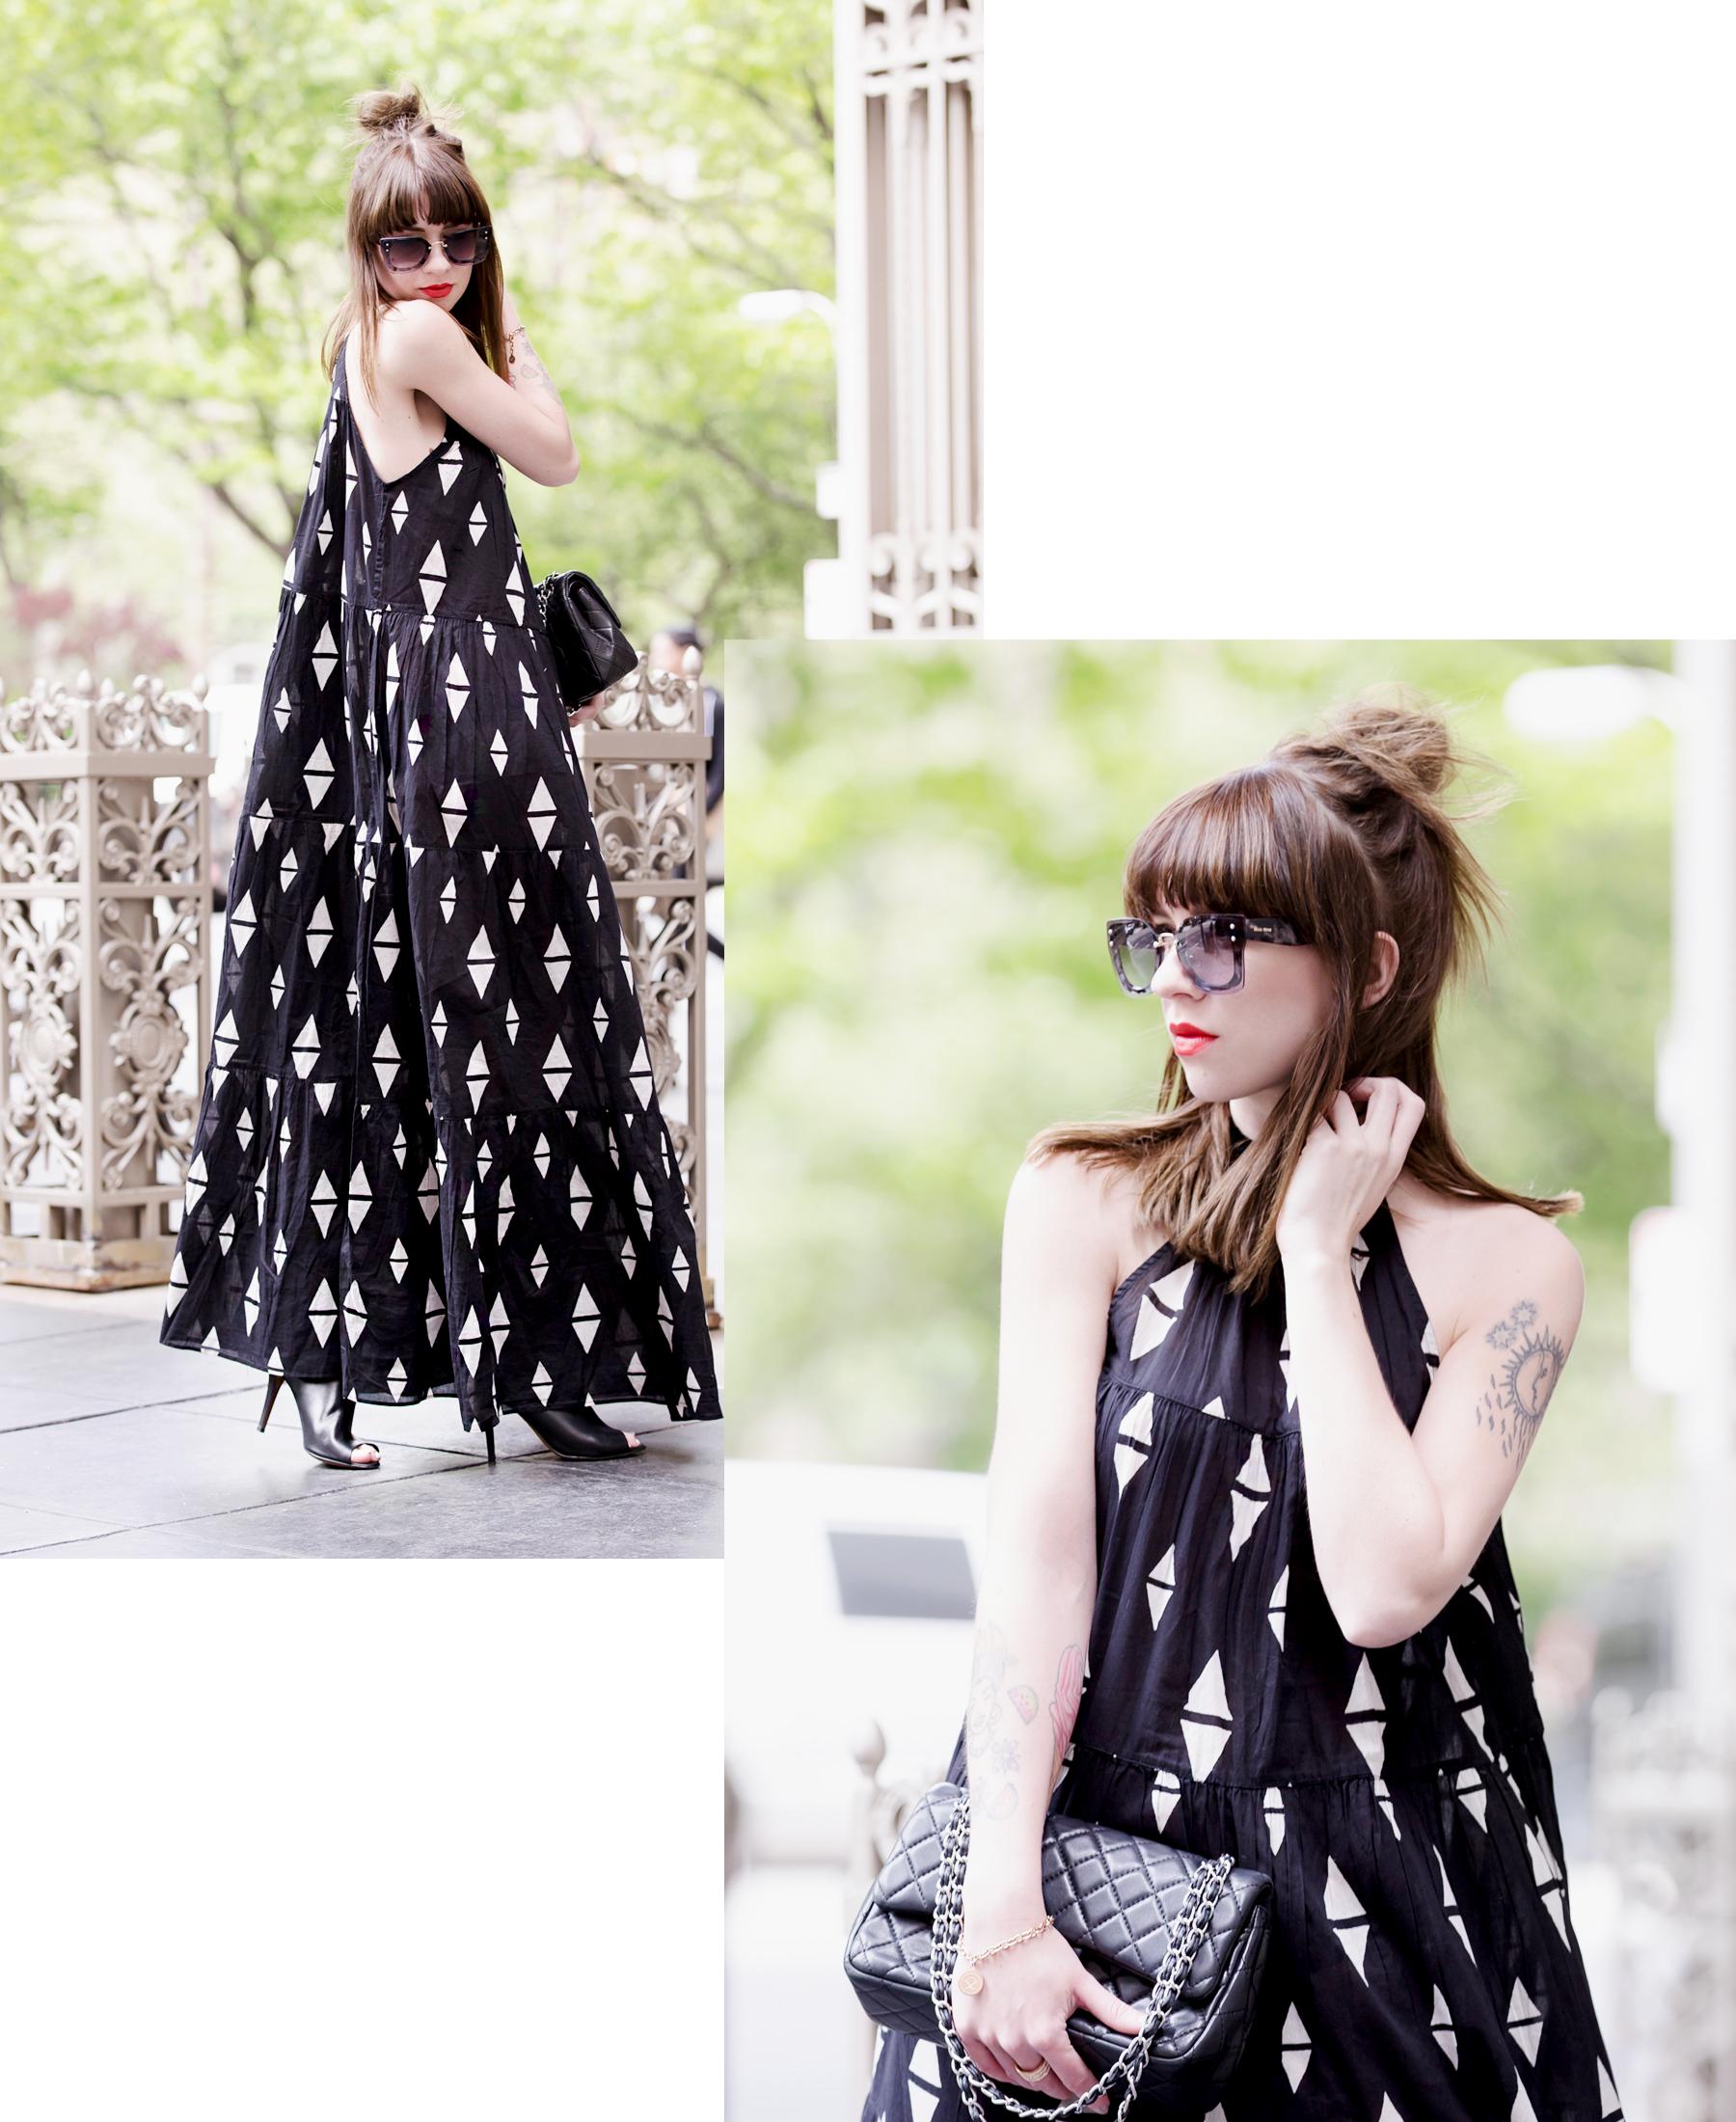 h&m maxi dress miu miu sunglasses chanel 2.55 double flap bag sacha heels ootd outfit styling fashionblogger modeblogger germany ricarda schernus cats & dogs styleblog 5